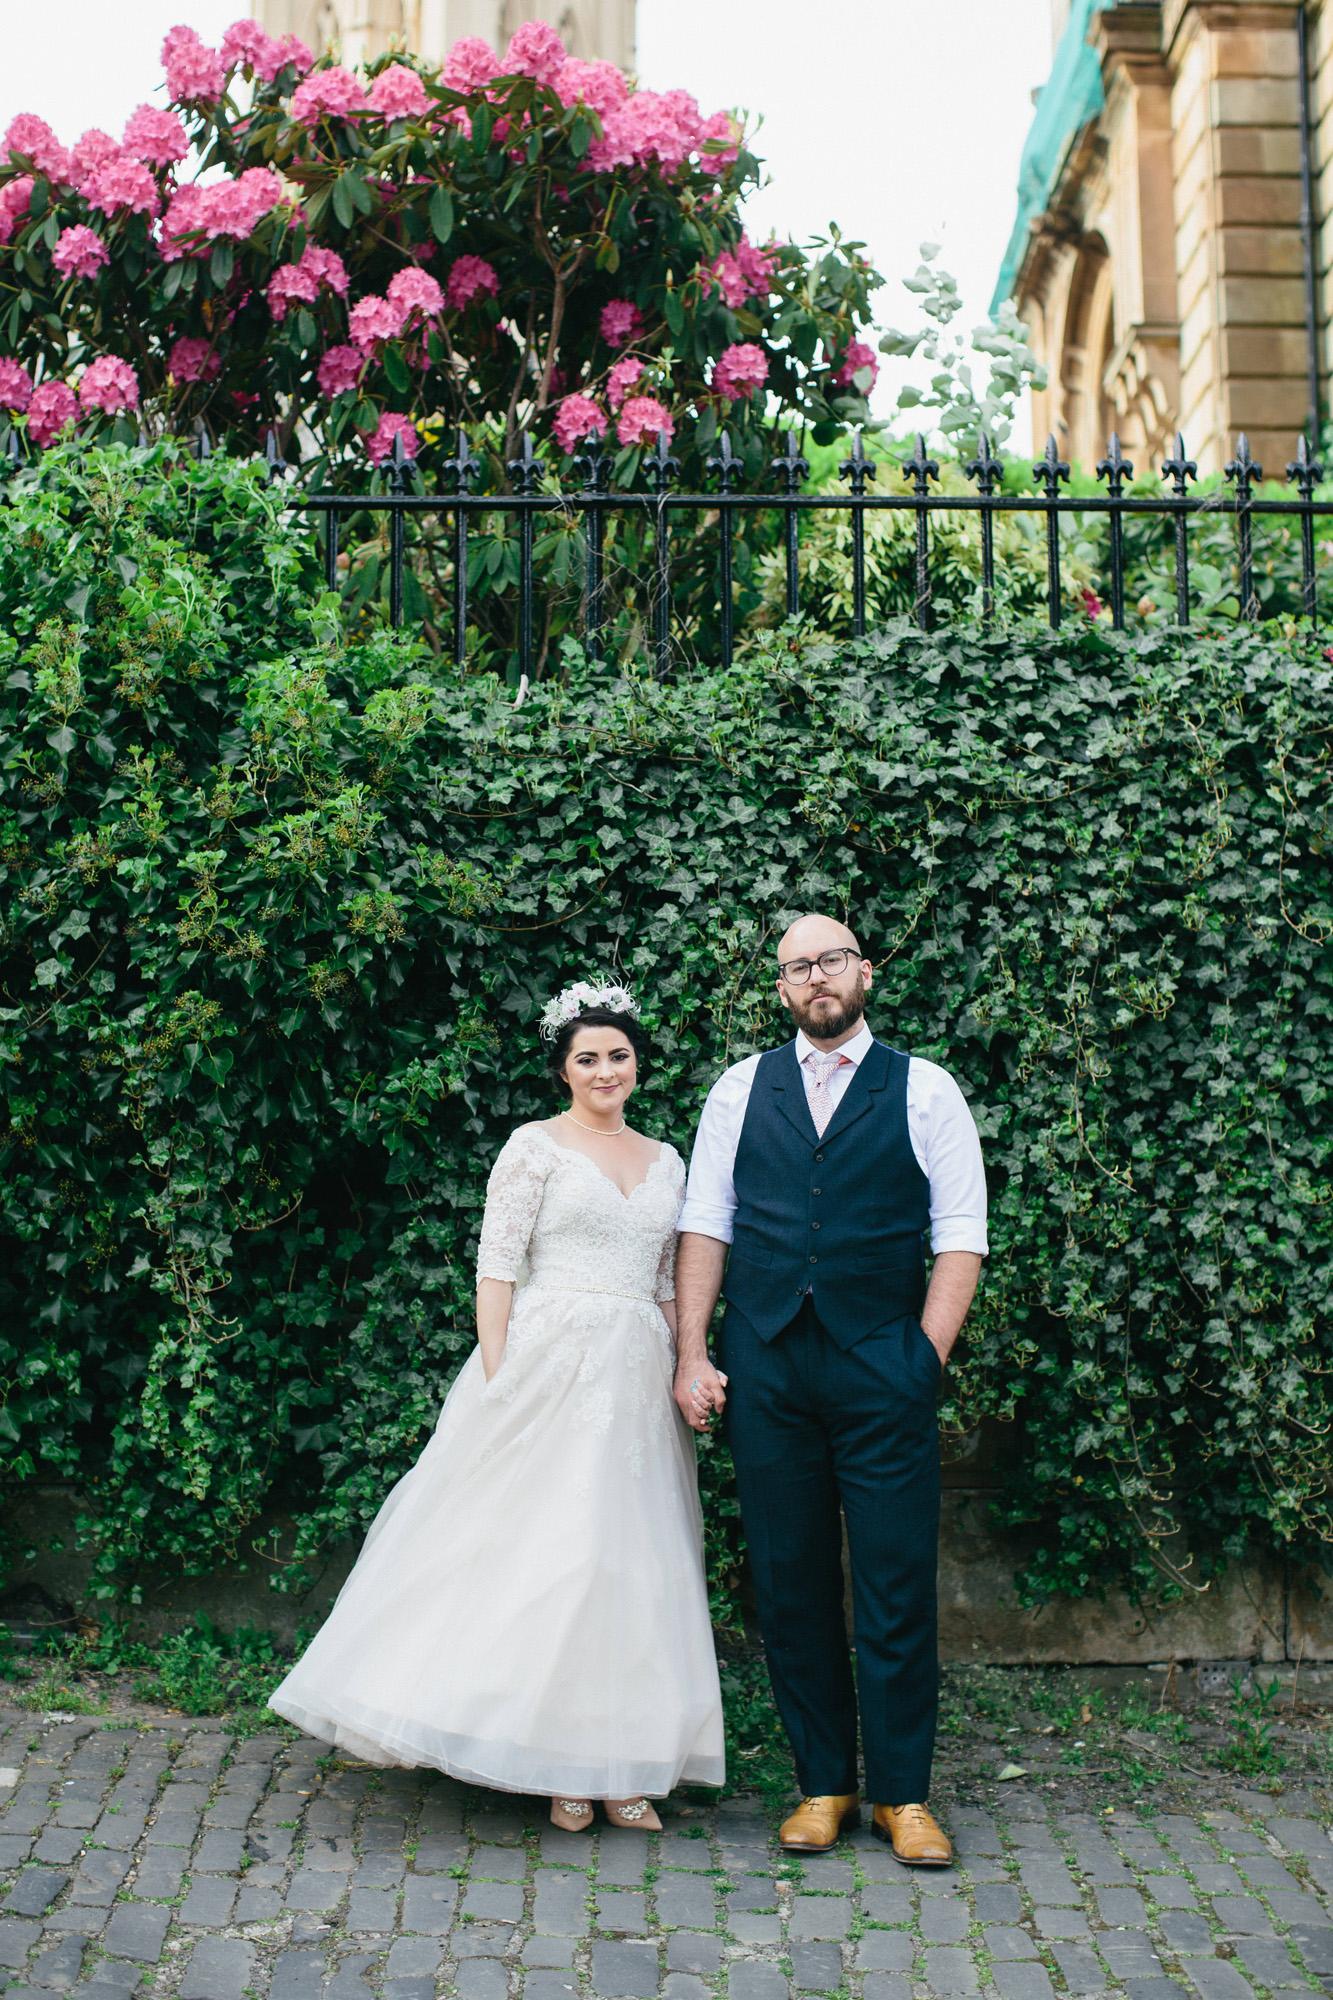 Quirky Wedding Photography Glasgow West End 056.jpg